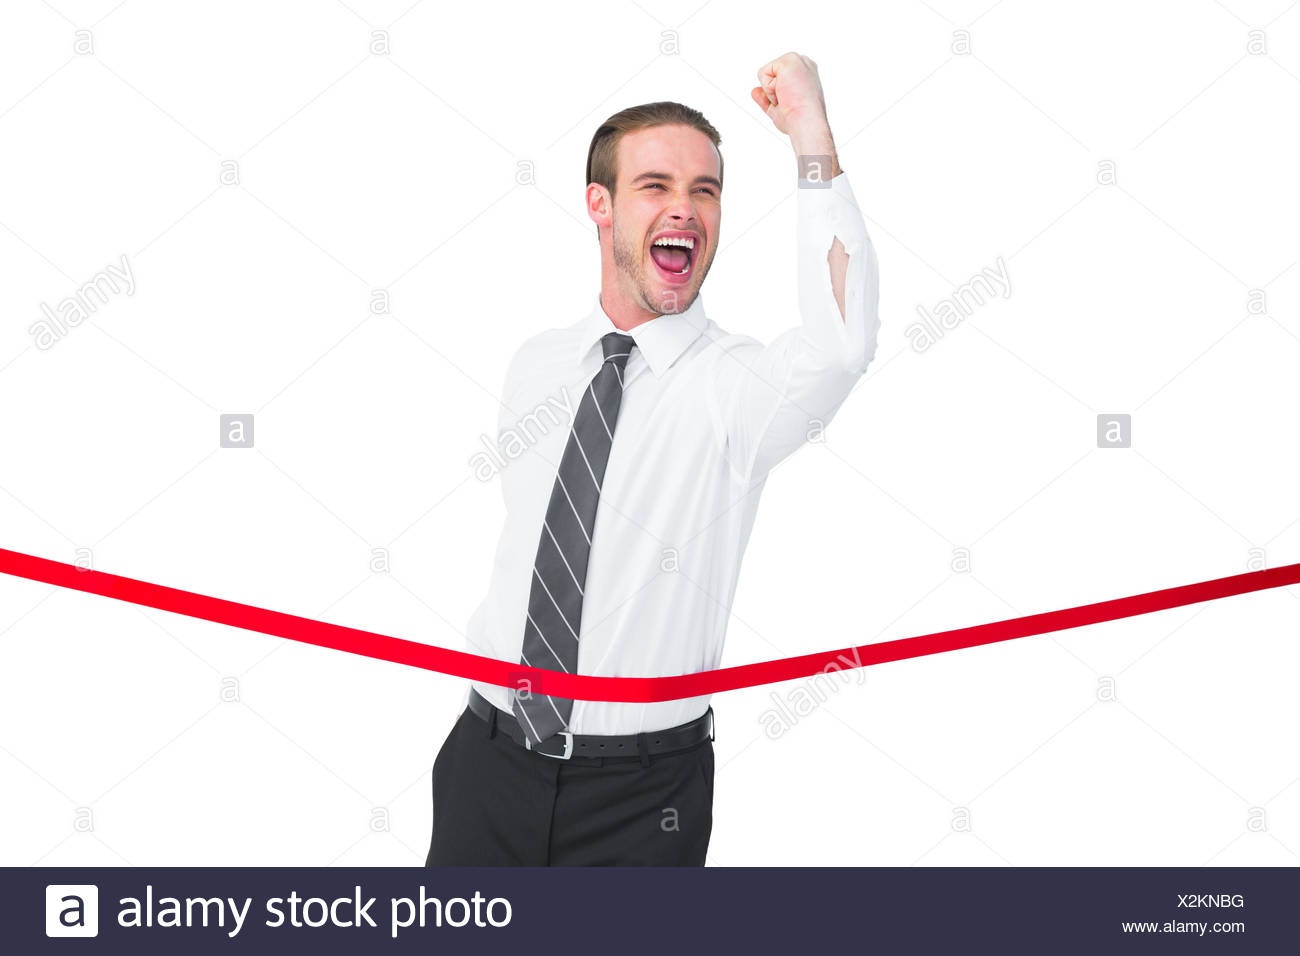 Massive male anal insertion